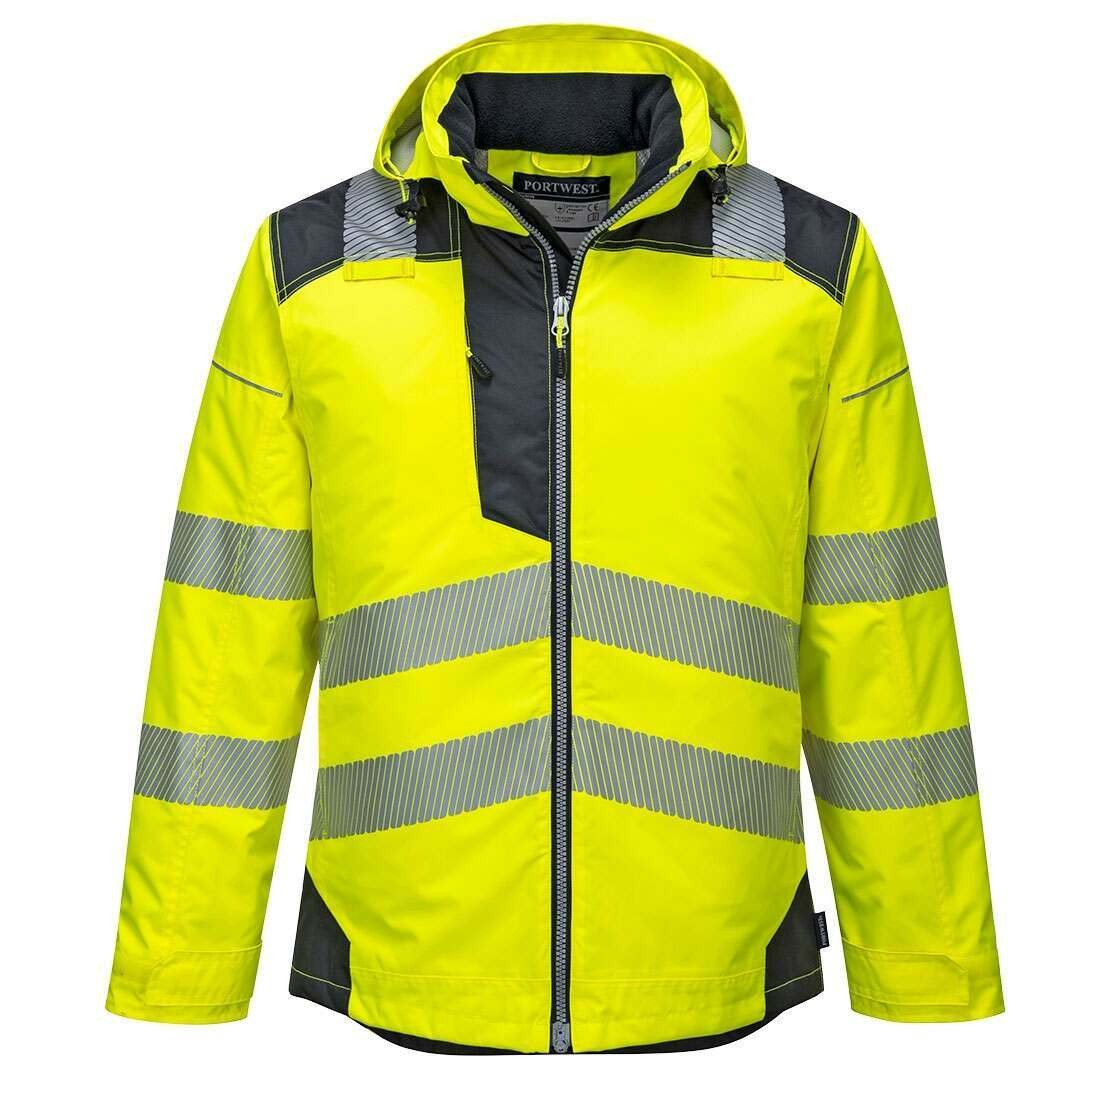 PW3 Hi-Vis Winter Jacket